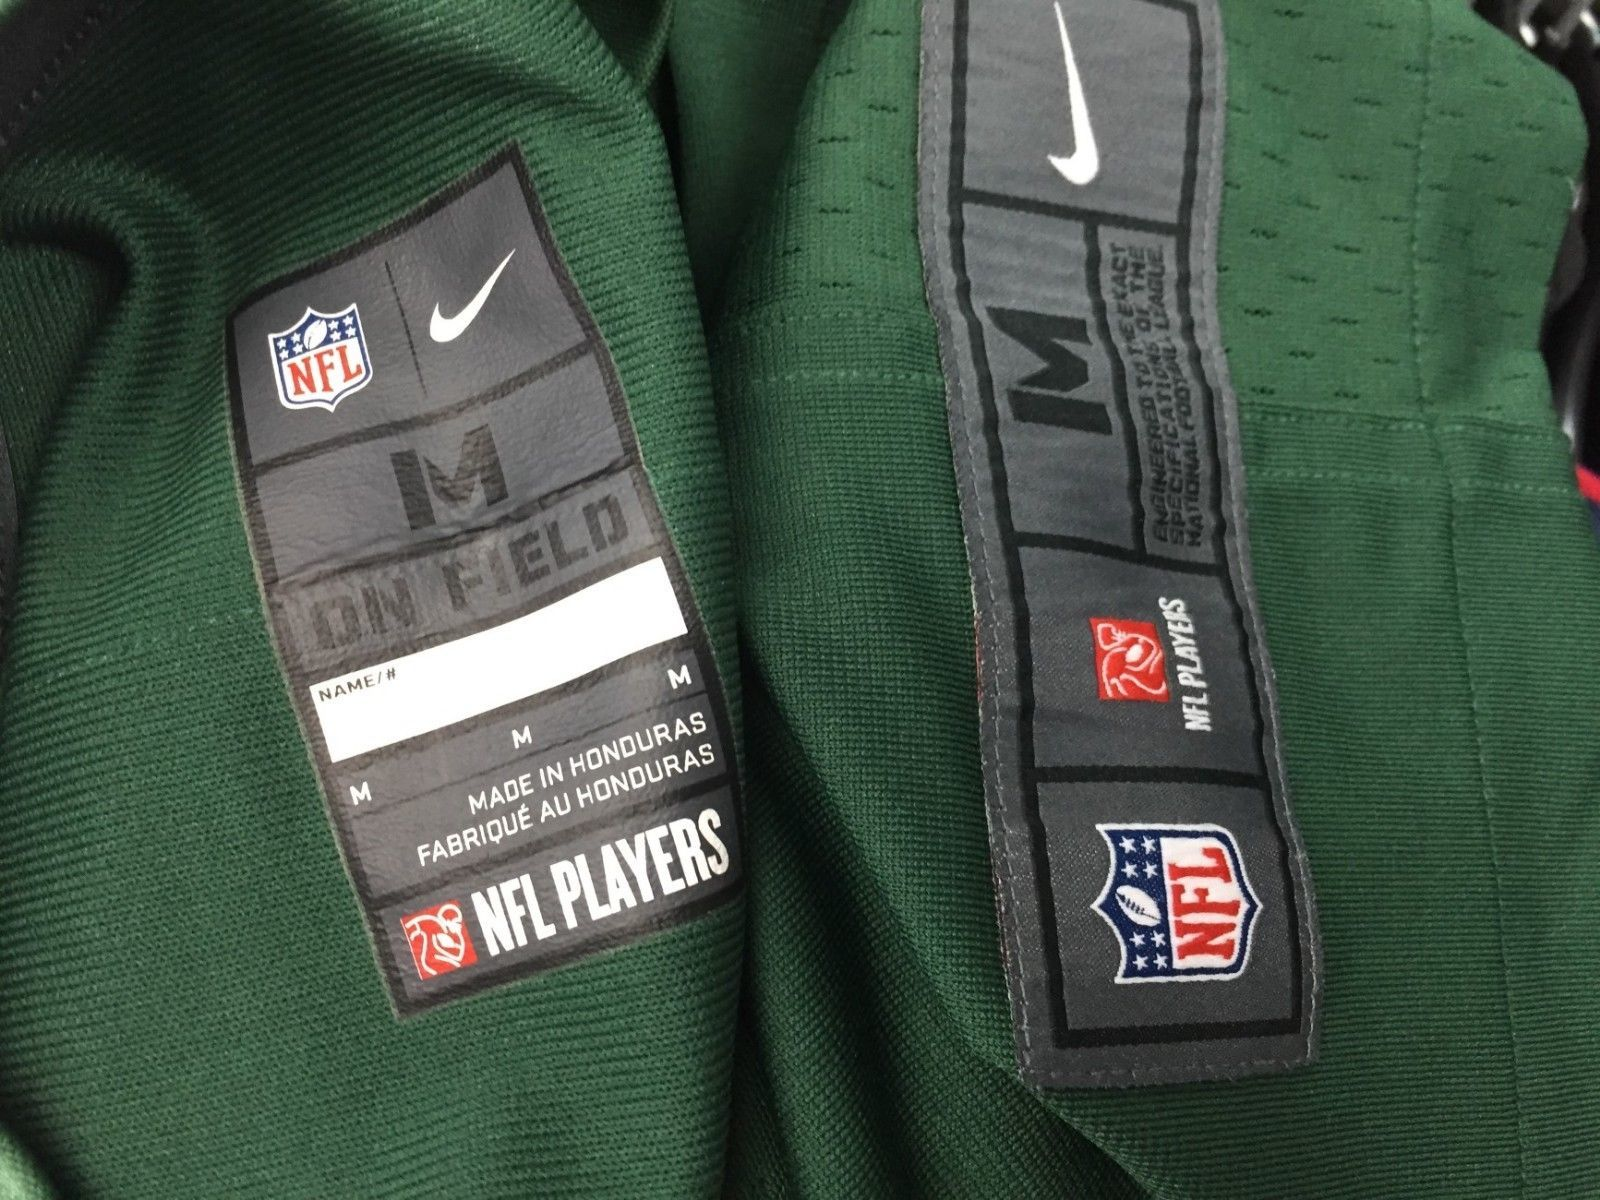 Trikot New York Jets (M)#6 Mark Sanchez NFL Shirt Jersey Nike